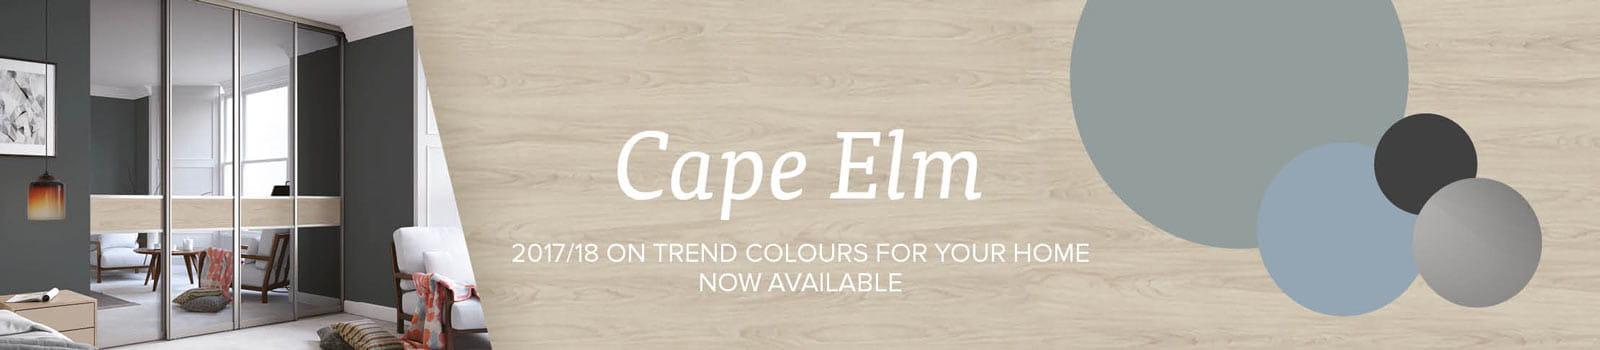 Cape Elm